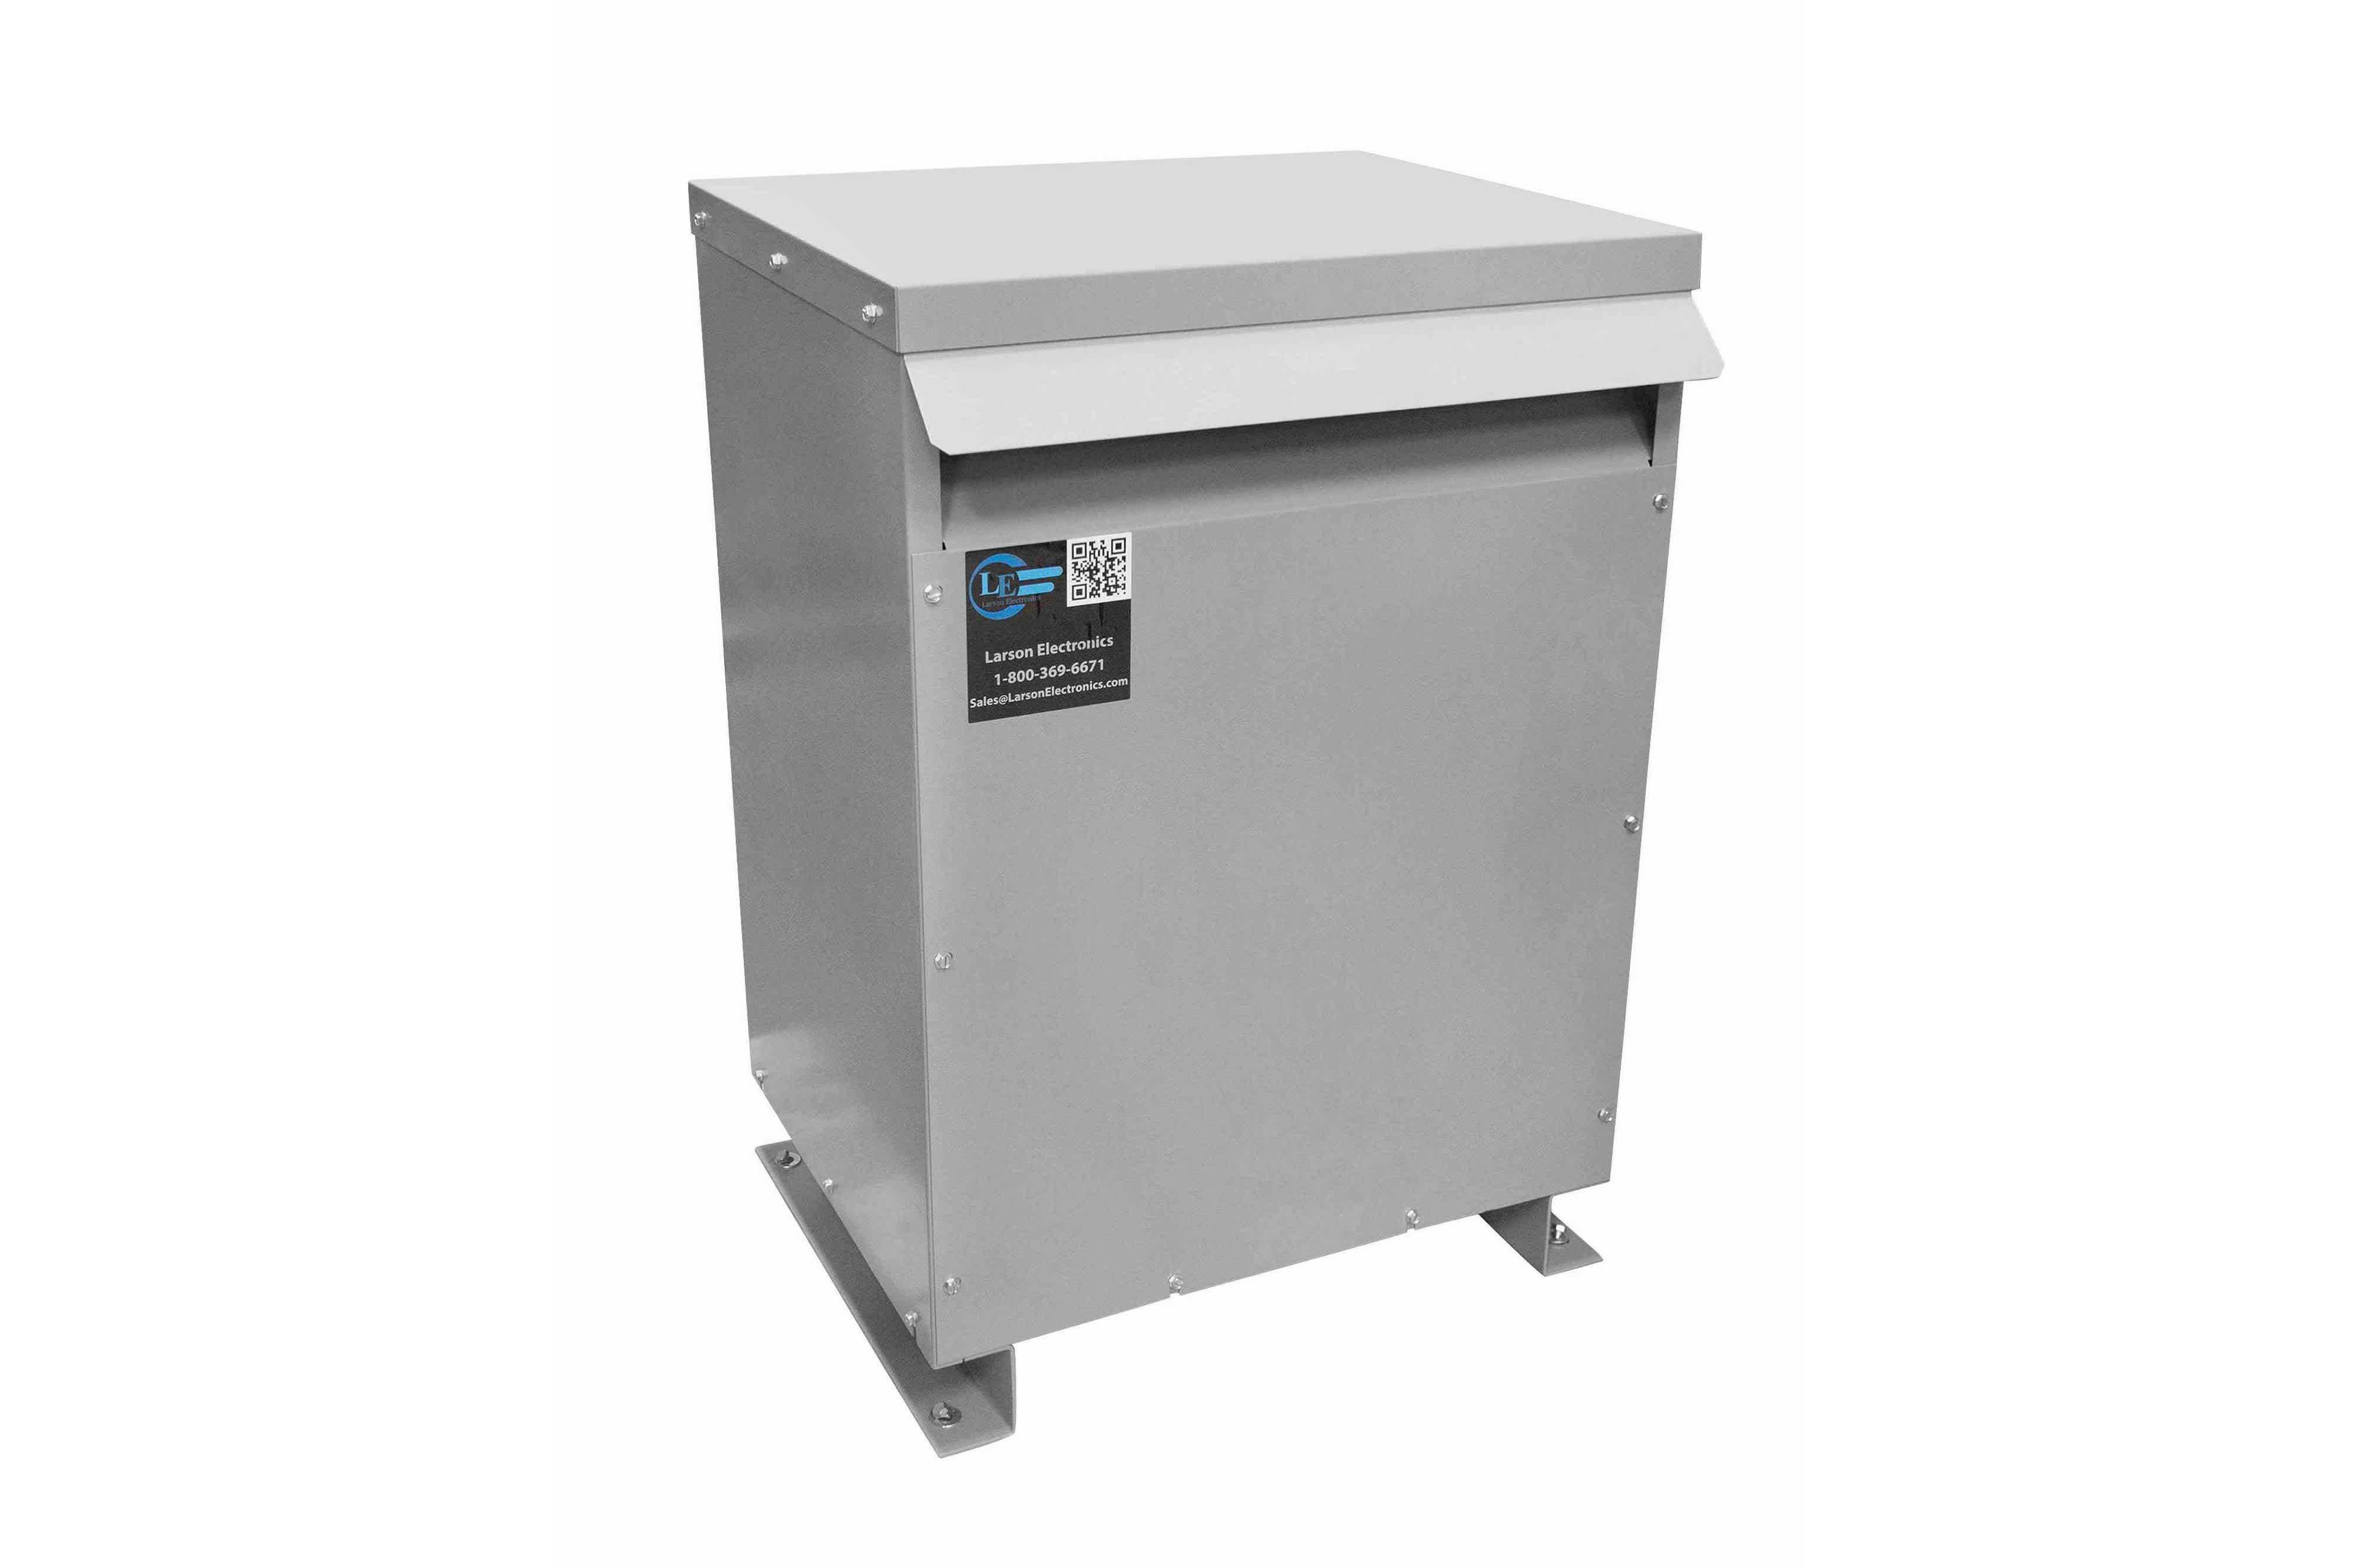 225 kVA 3PH Isolation Transformer, 460V Wye Primary, 415V Delta Secondary, N3R, Ventilated, 60 Hz